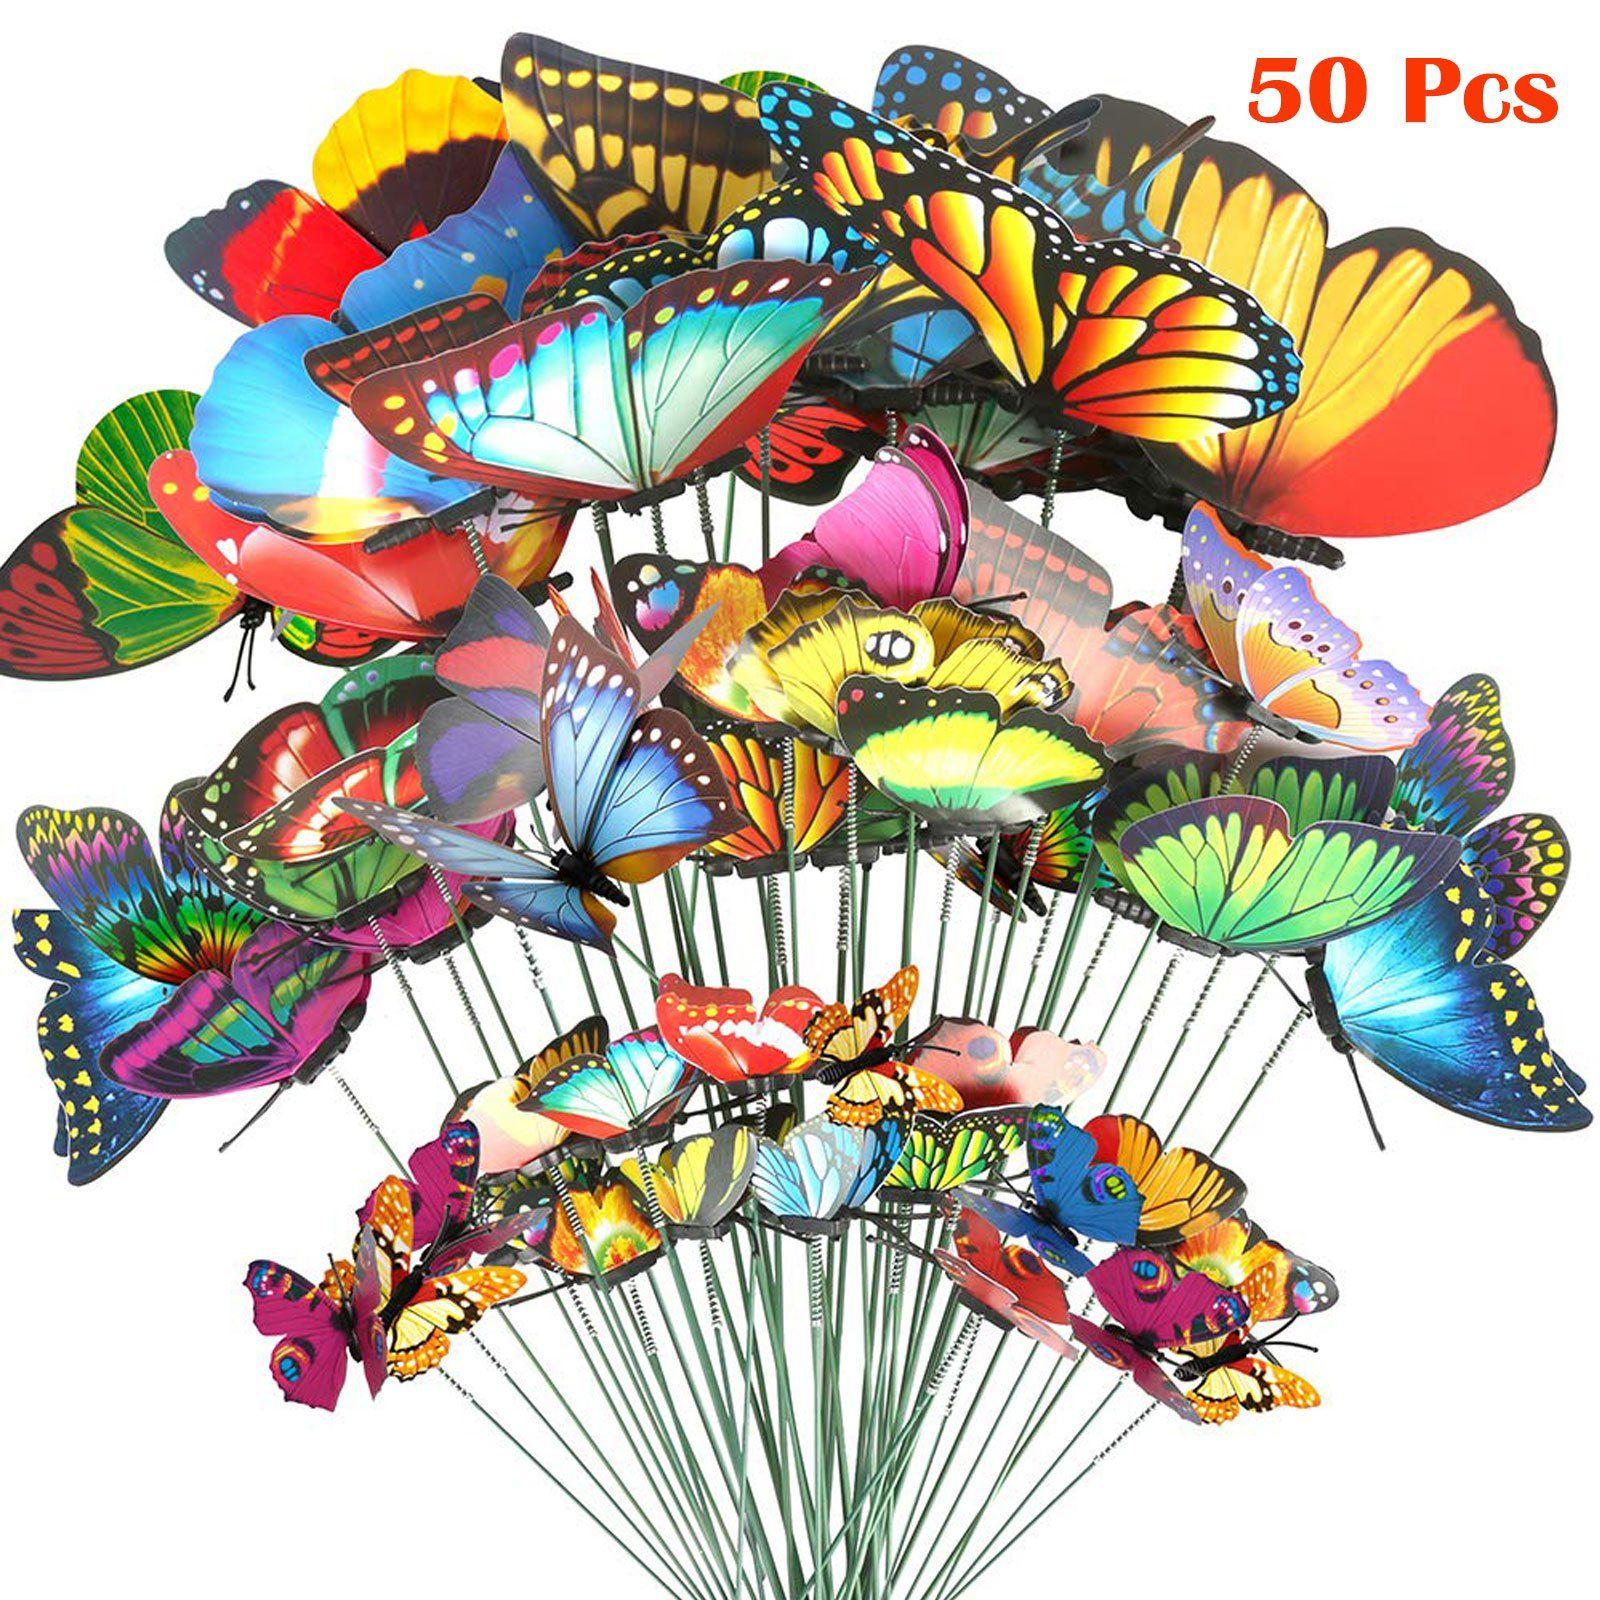 Eeekit 50pcs butterfly stakes outdoor yard planter flower